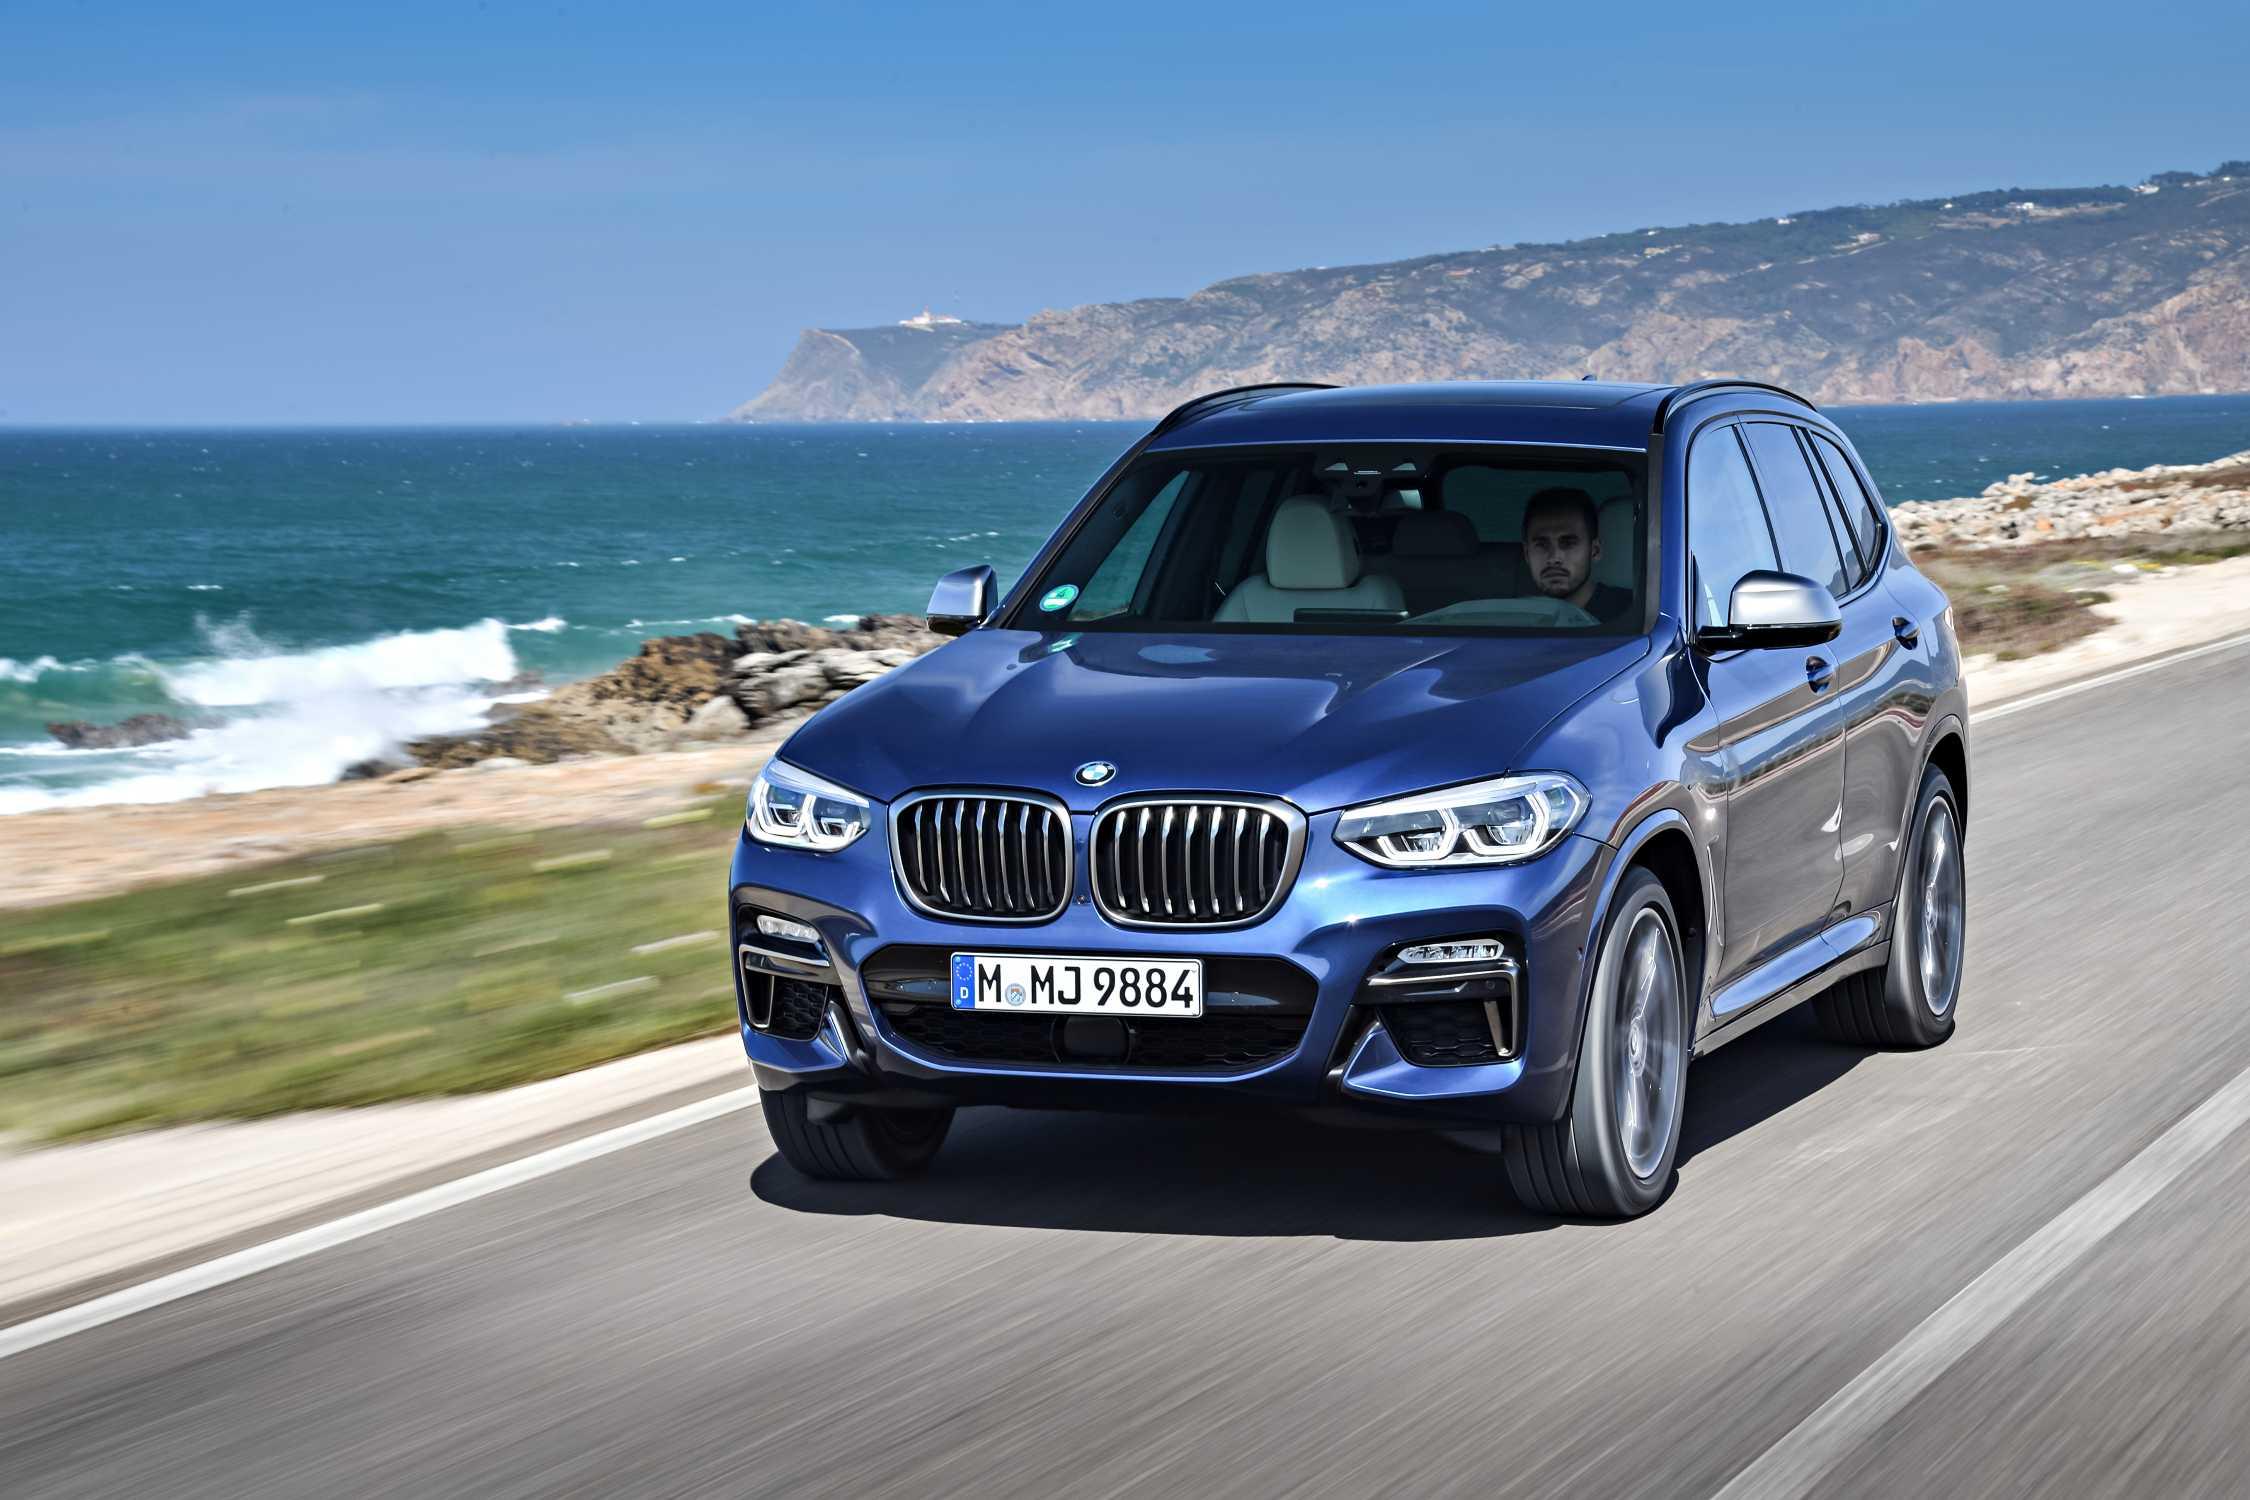 Der neue BMW X3 M40i,Phytonic Blau (10/2017).